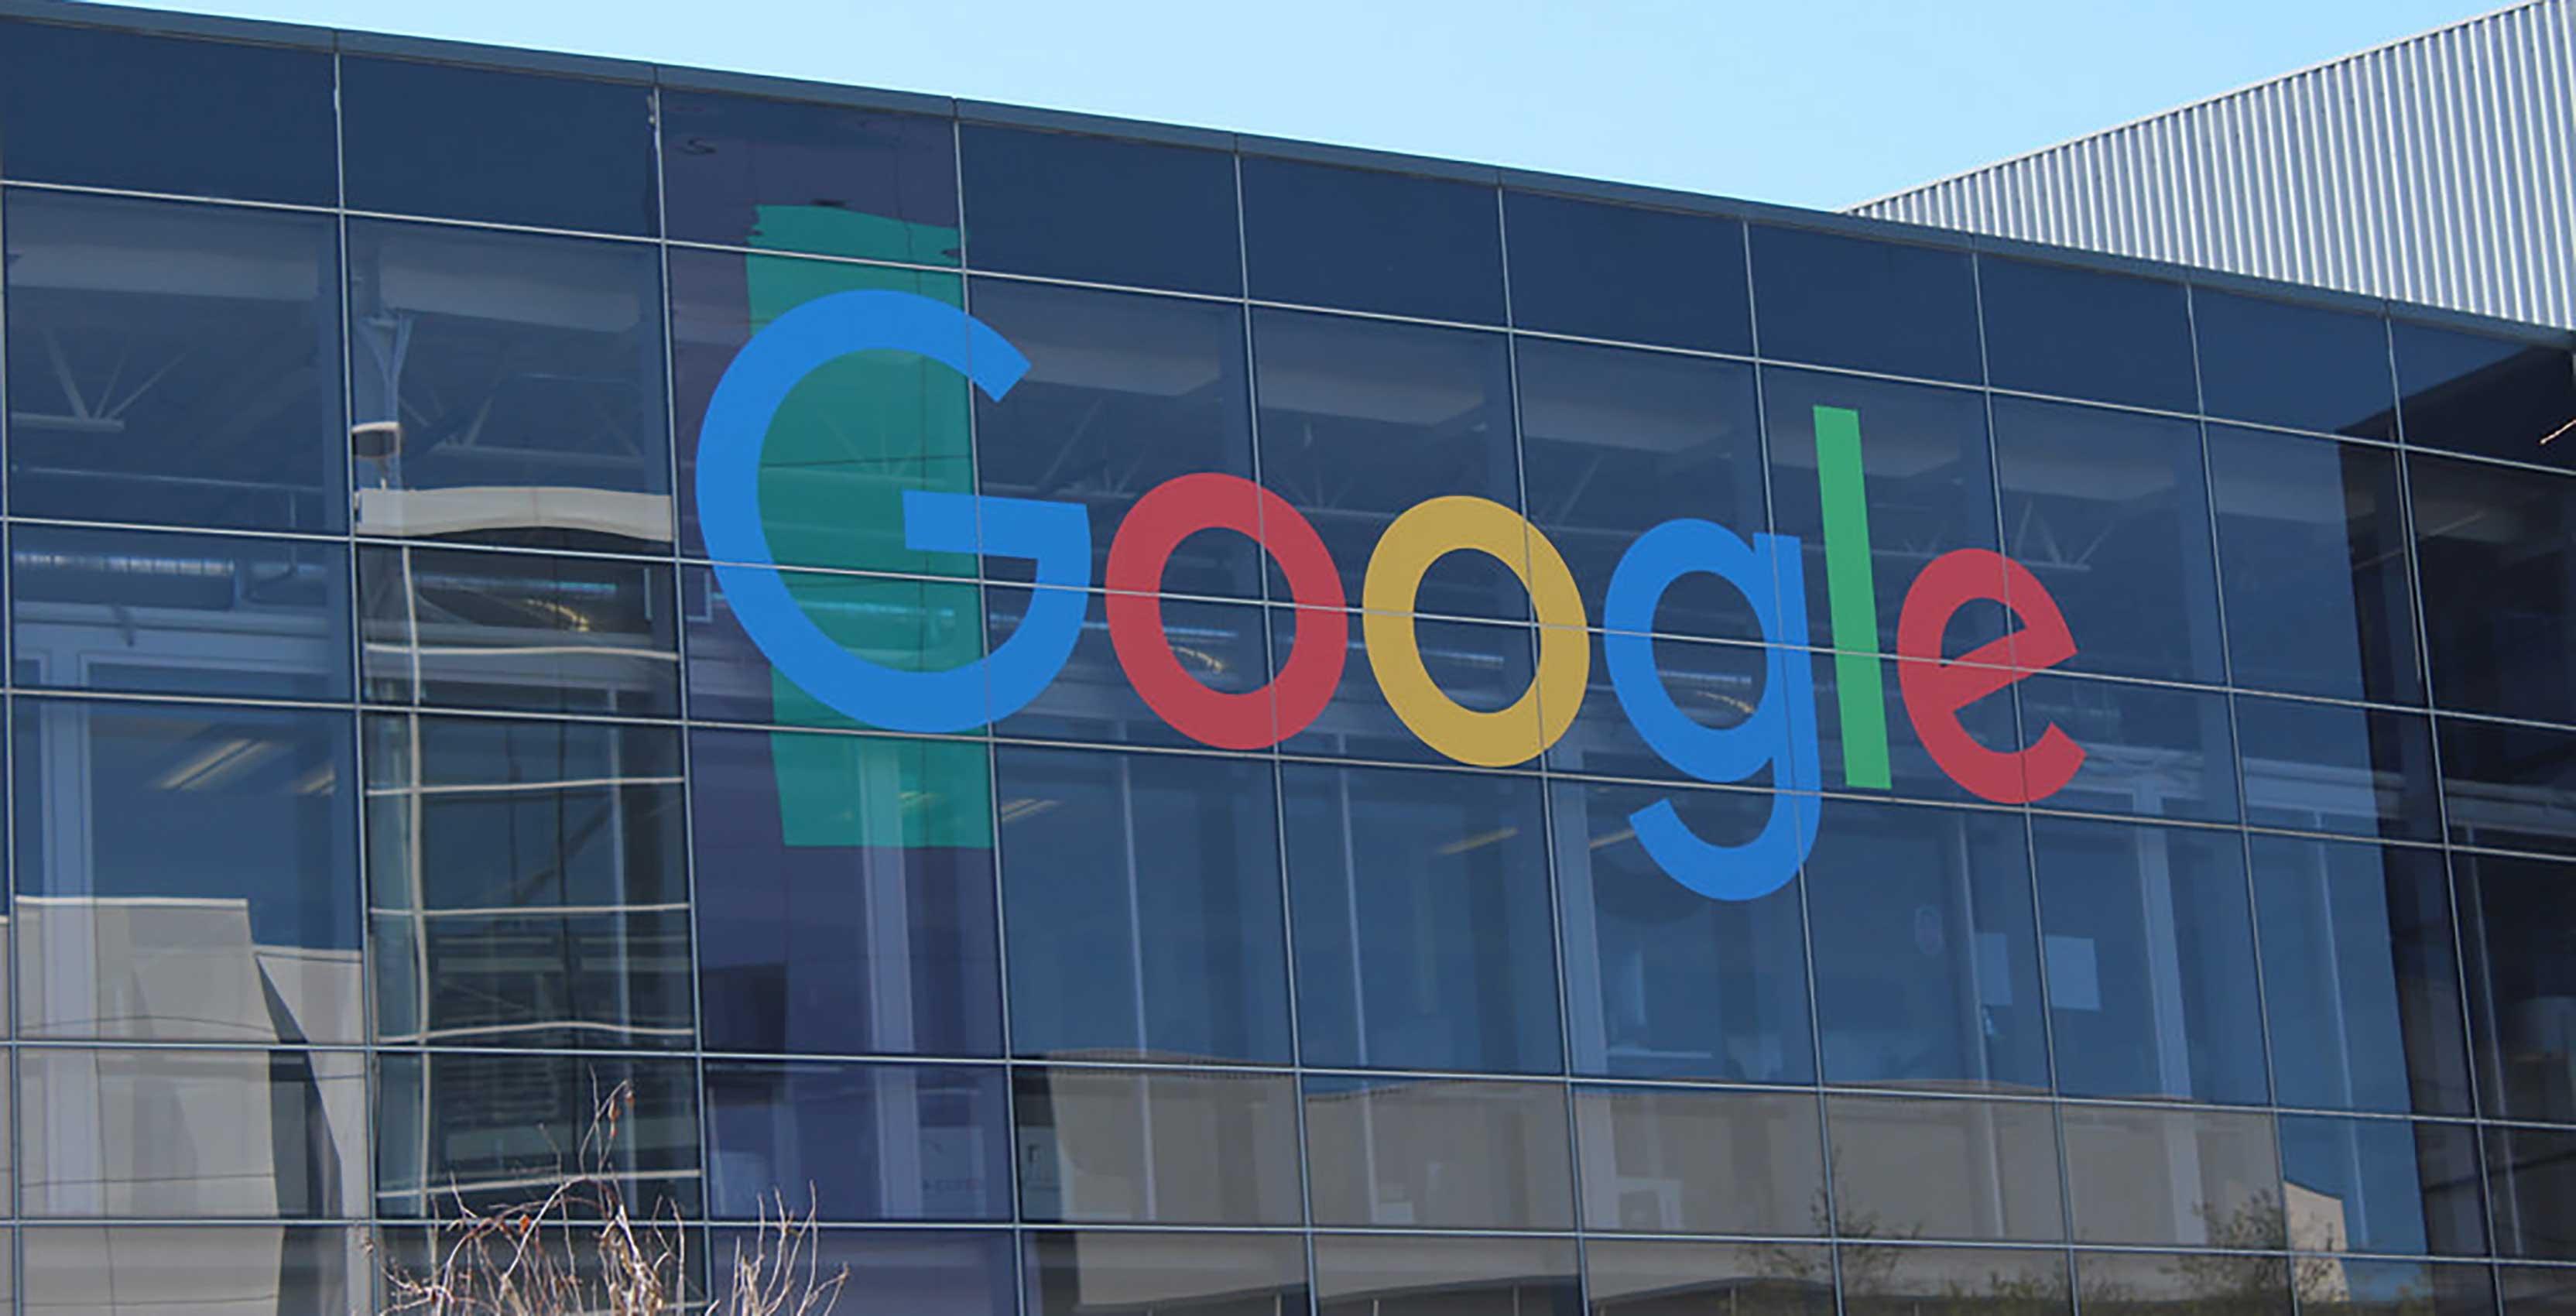 Google HQ logo on building